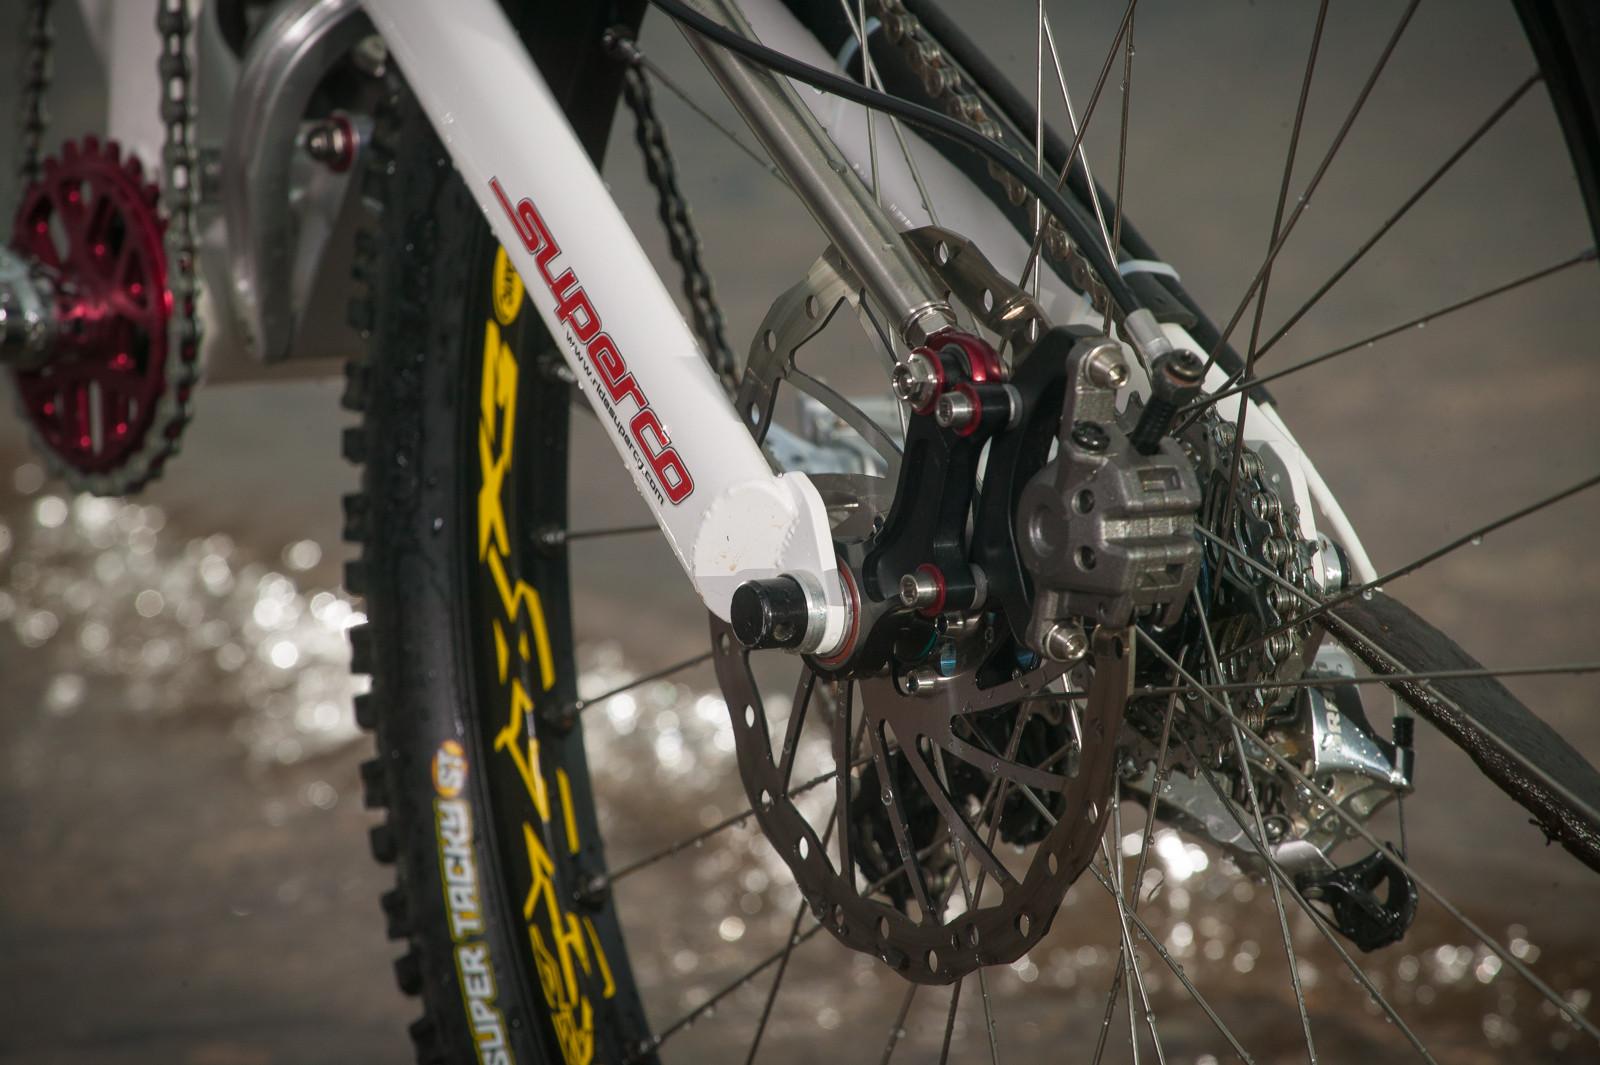 Flashback - Superco Silencer Prototype DH Bike - Flashback - Superco Silencer Prototype DH Bike - Mountain Biking Pictures - Vital MTB